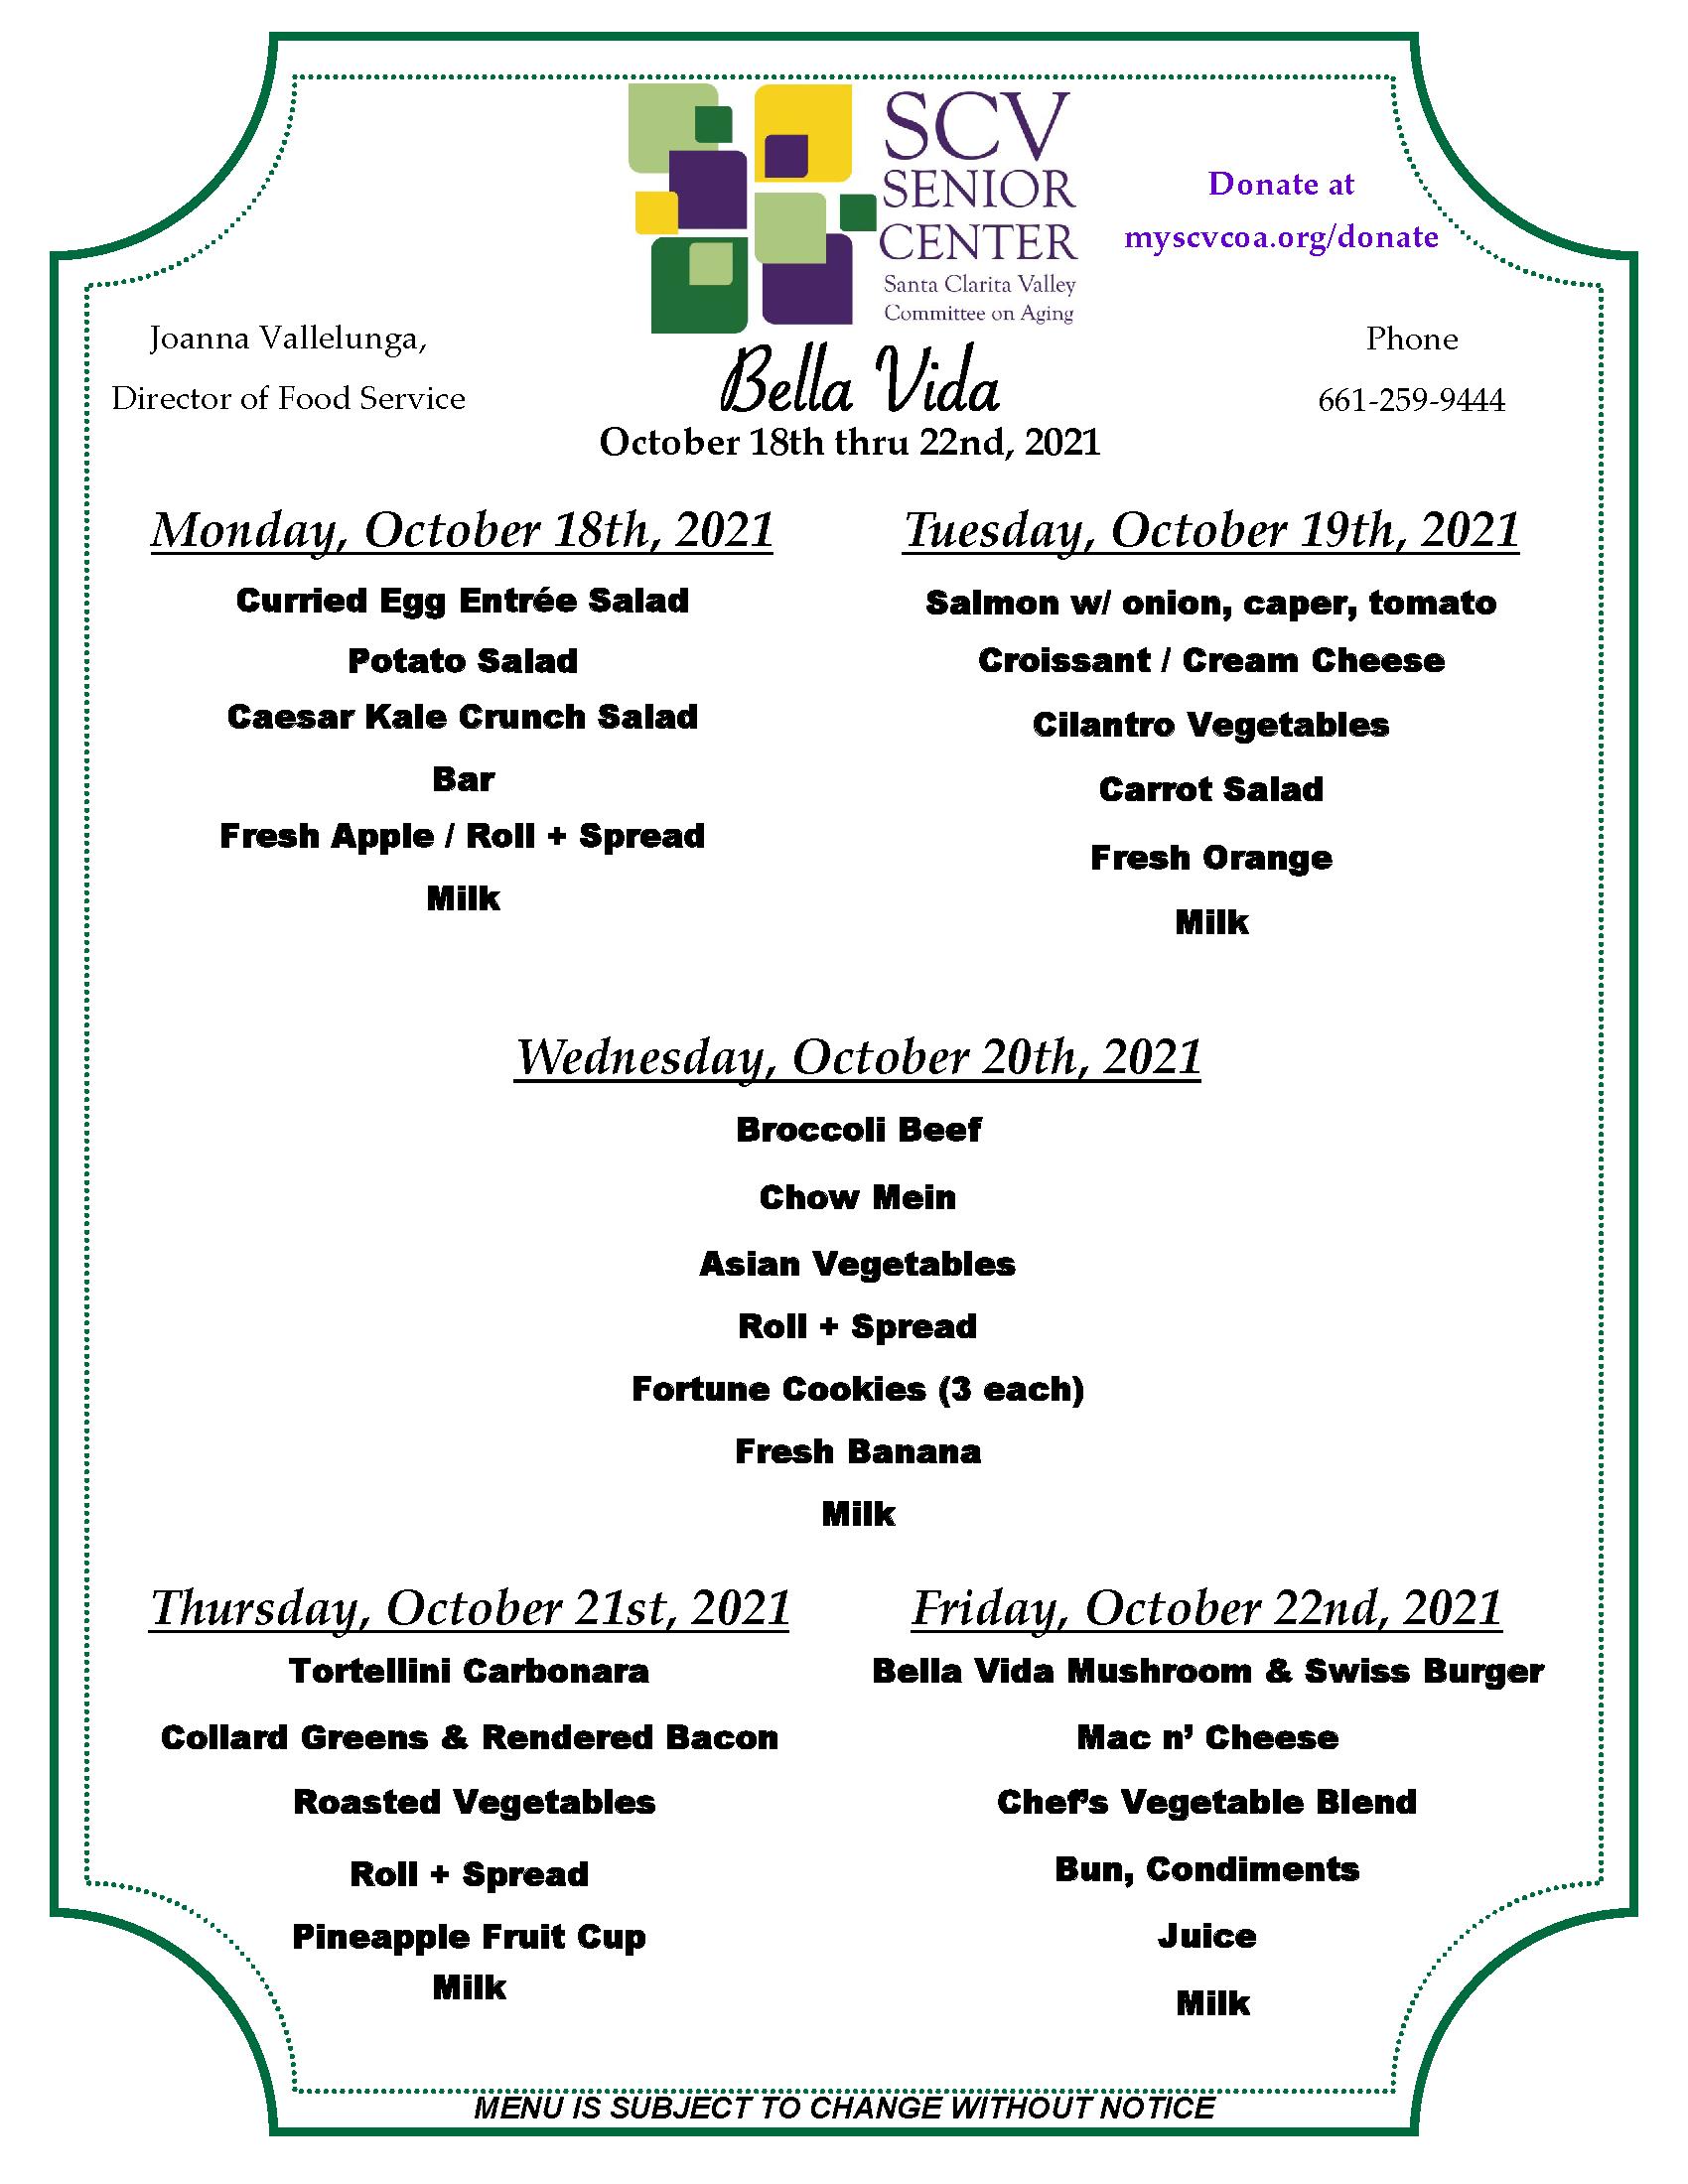 October18th thru 22nd menu